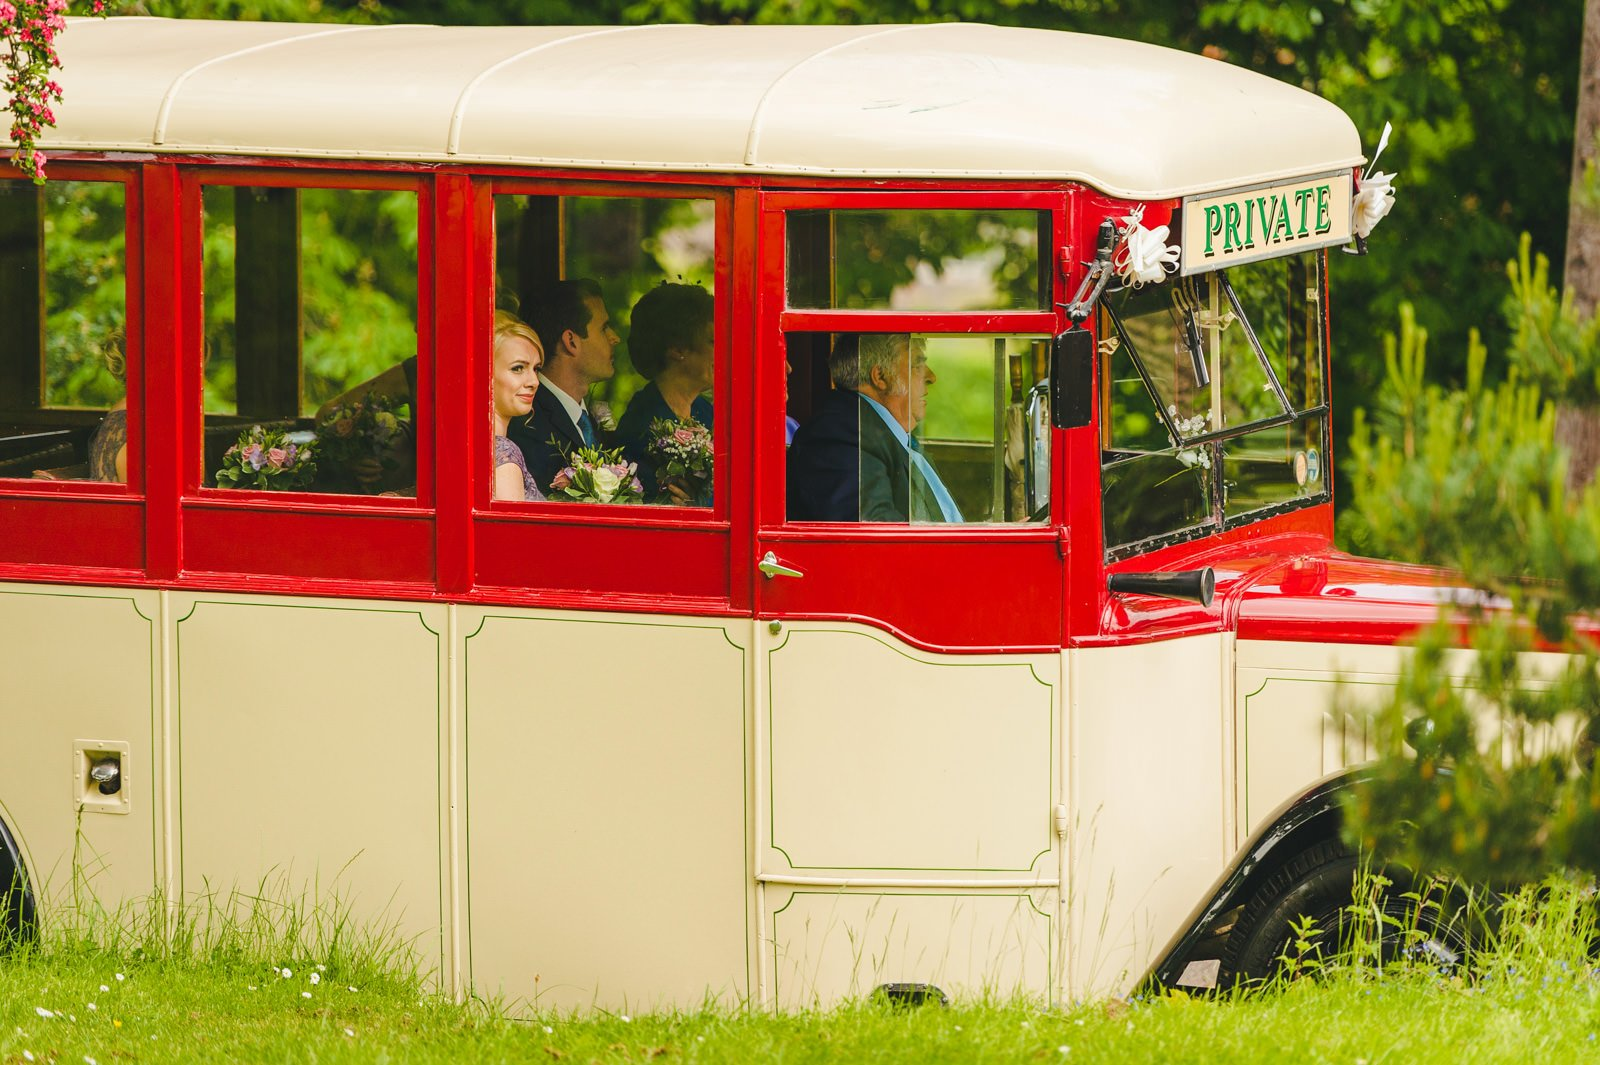 Millers Of Netley wedding, Dorrington, Shrewsbury | Emma + Ben 14